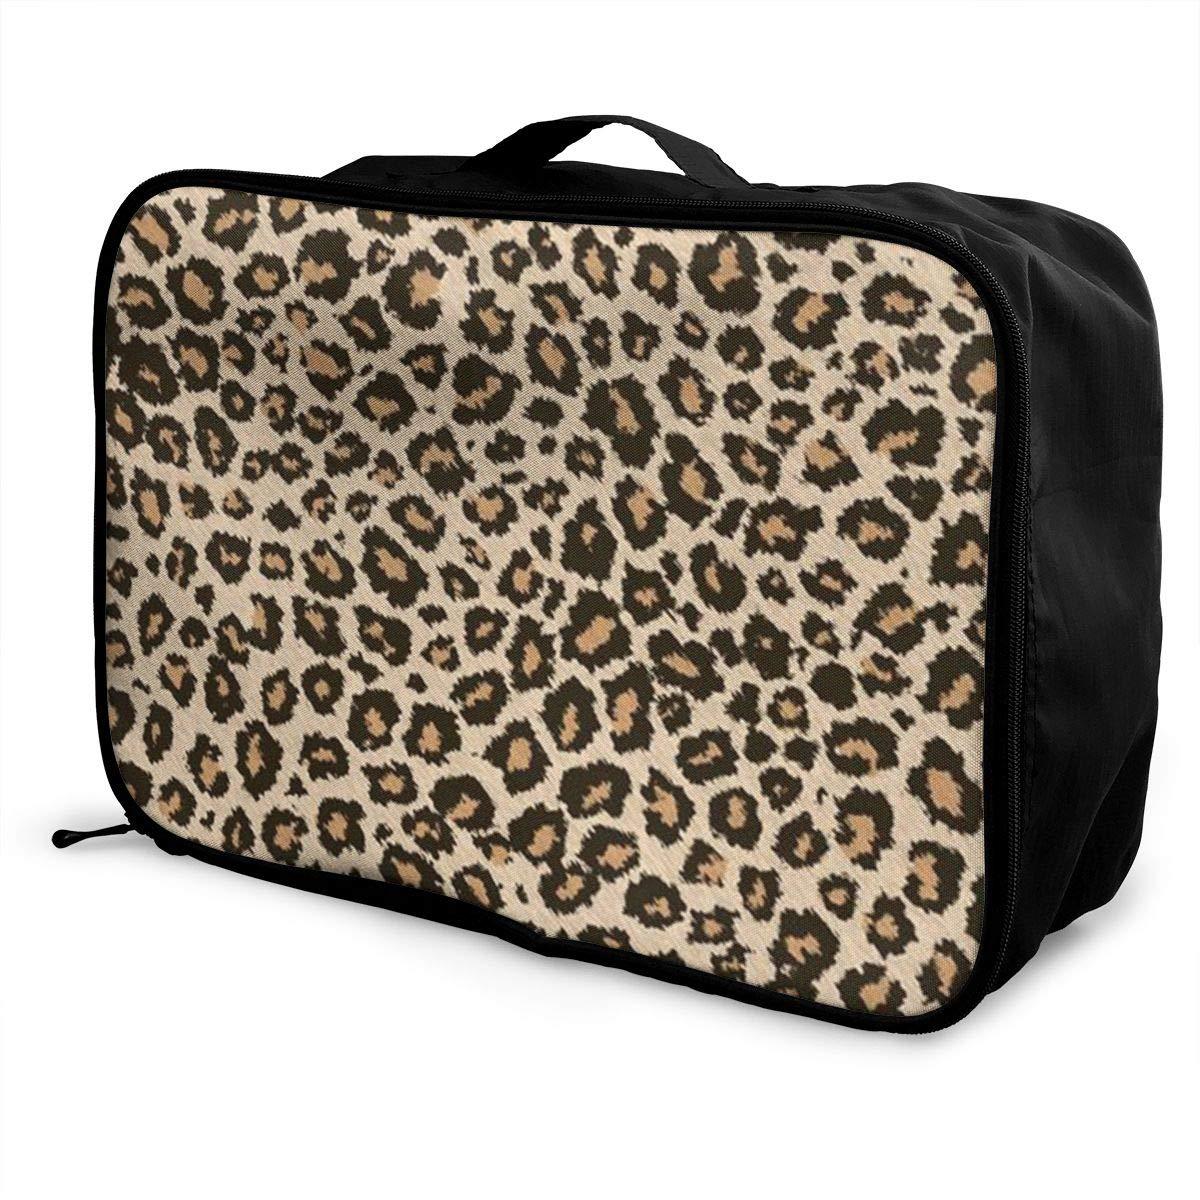 Women /& Men Foldable Travel Duffel Bag Cool Leopard Skin For Luggage Gym Sports